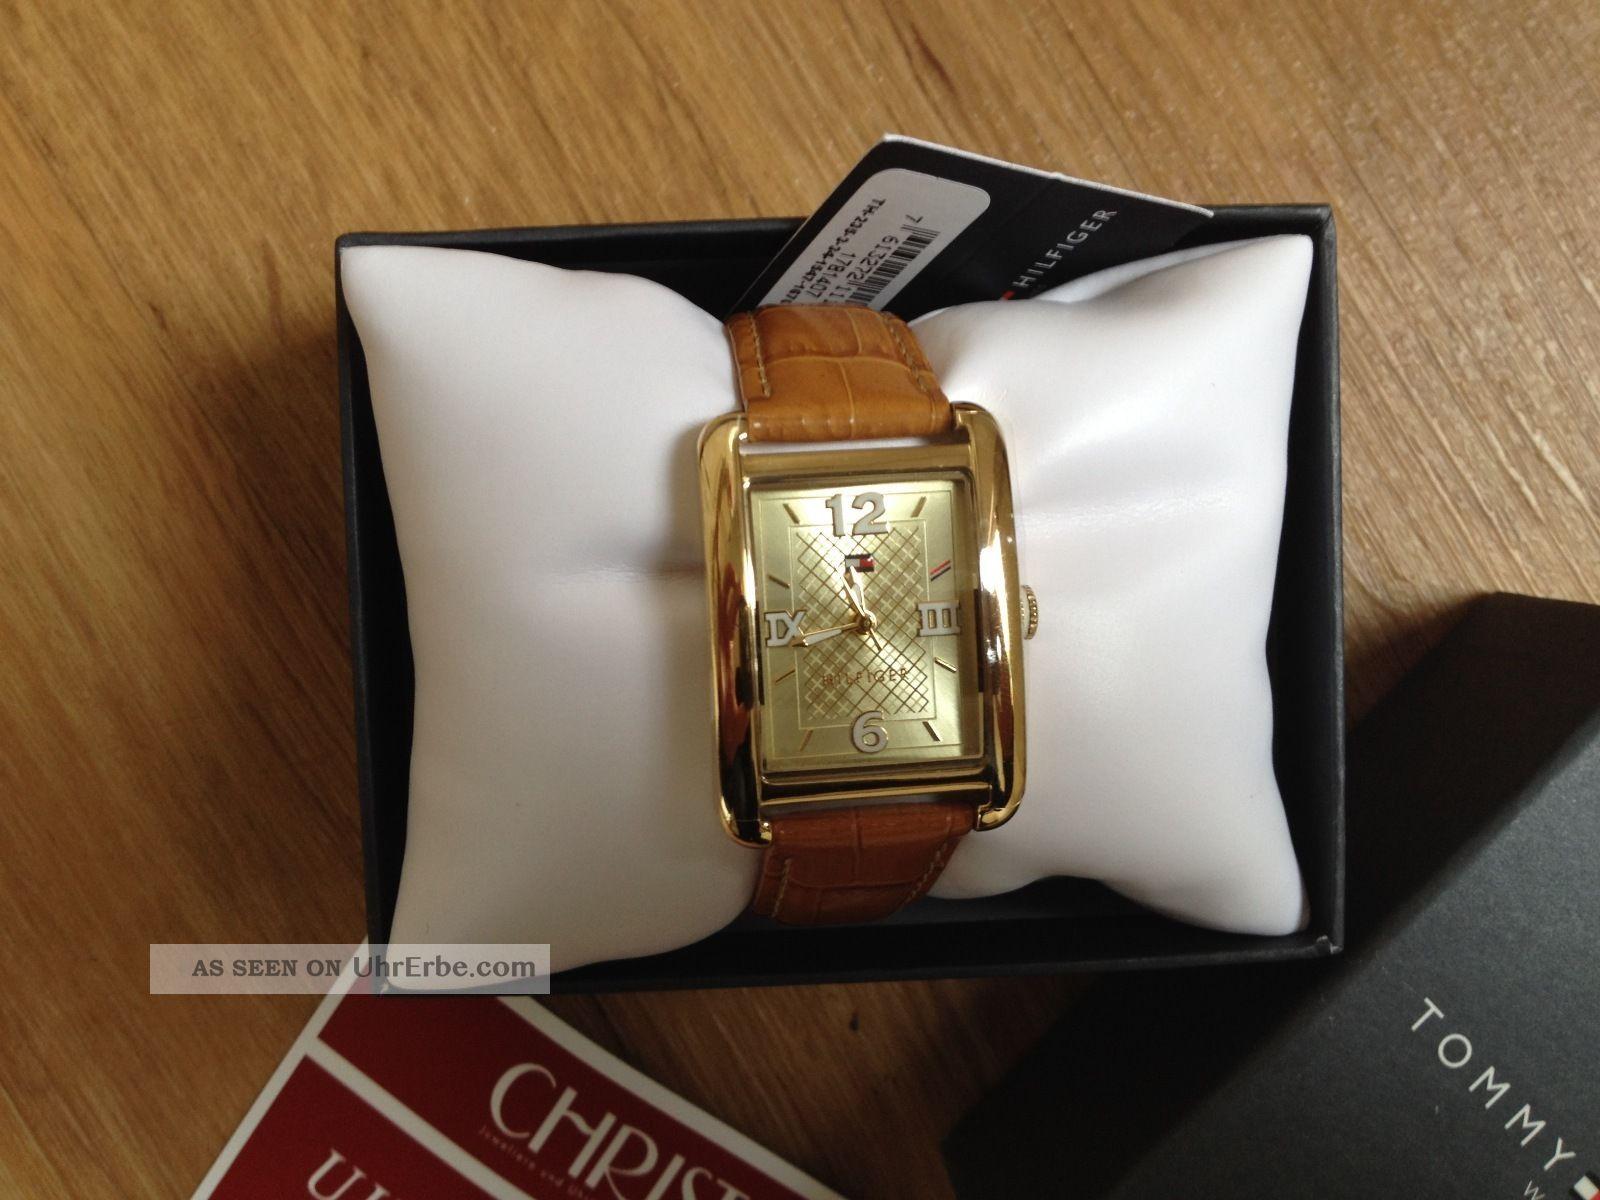 Tommy Hilfiger Armband - Uhr Emmie Gold / Camel / Braun Armbanduhren Bild